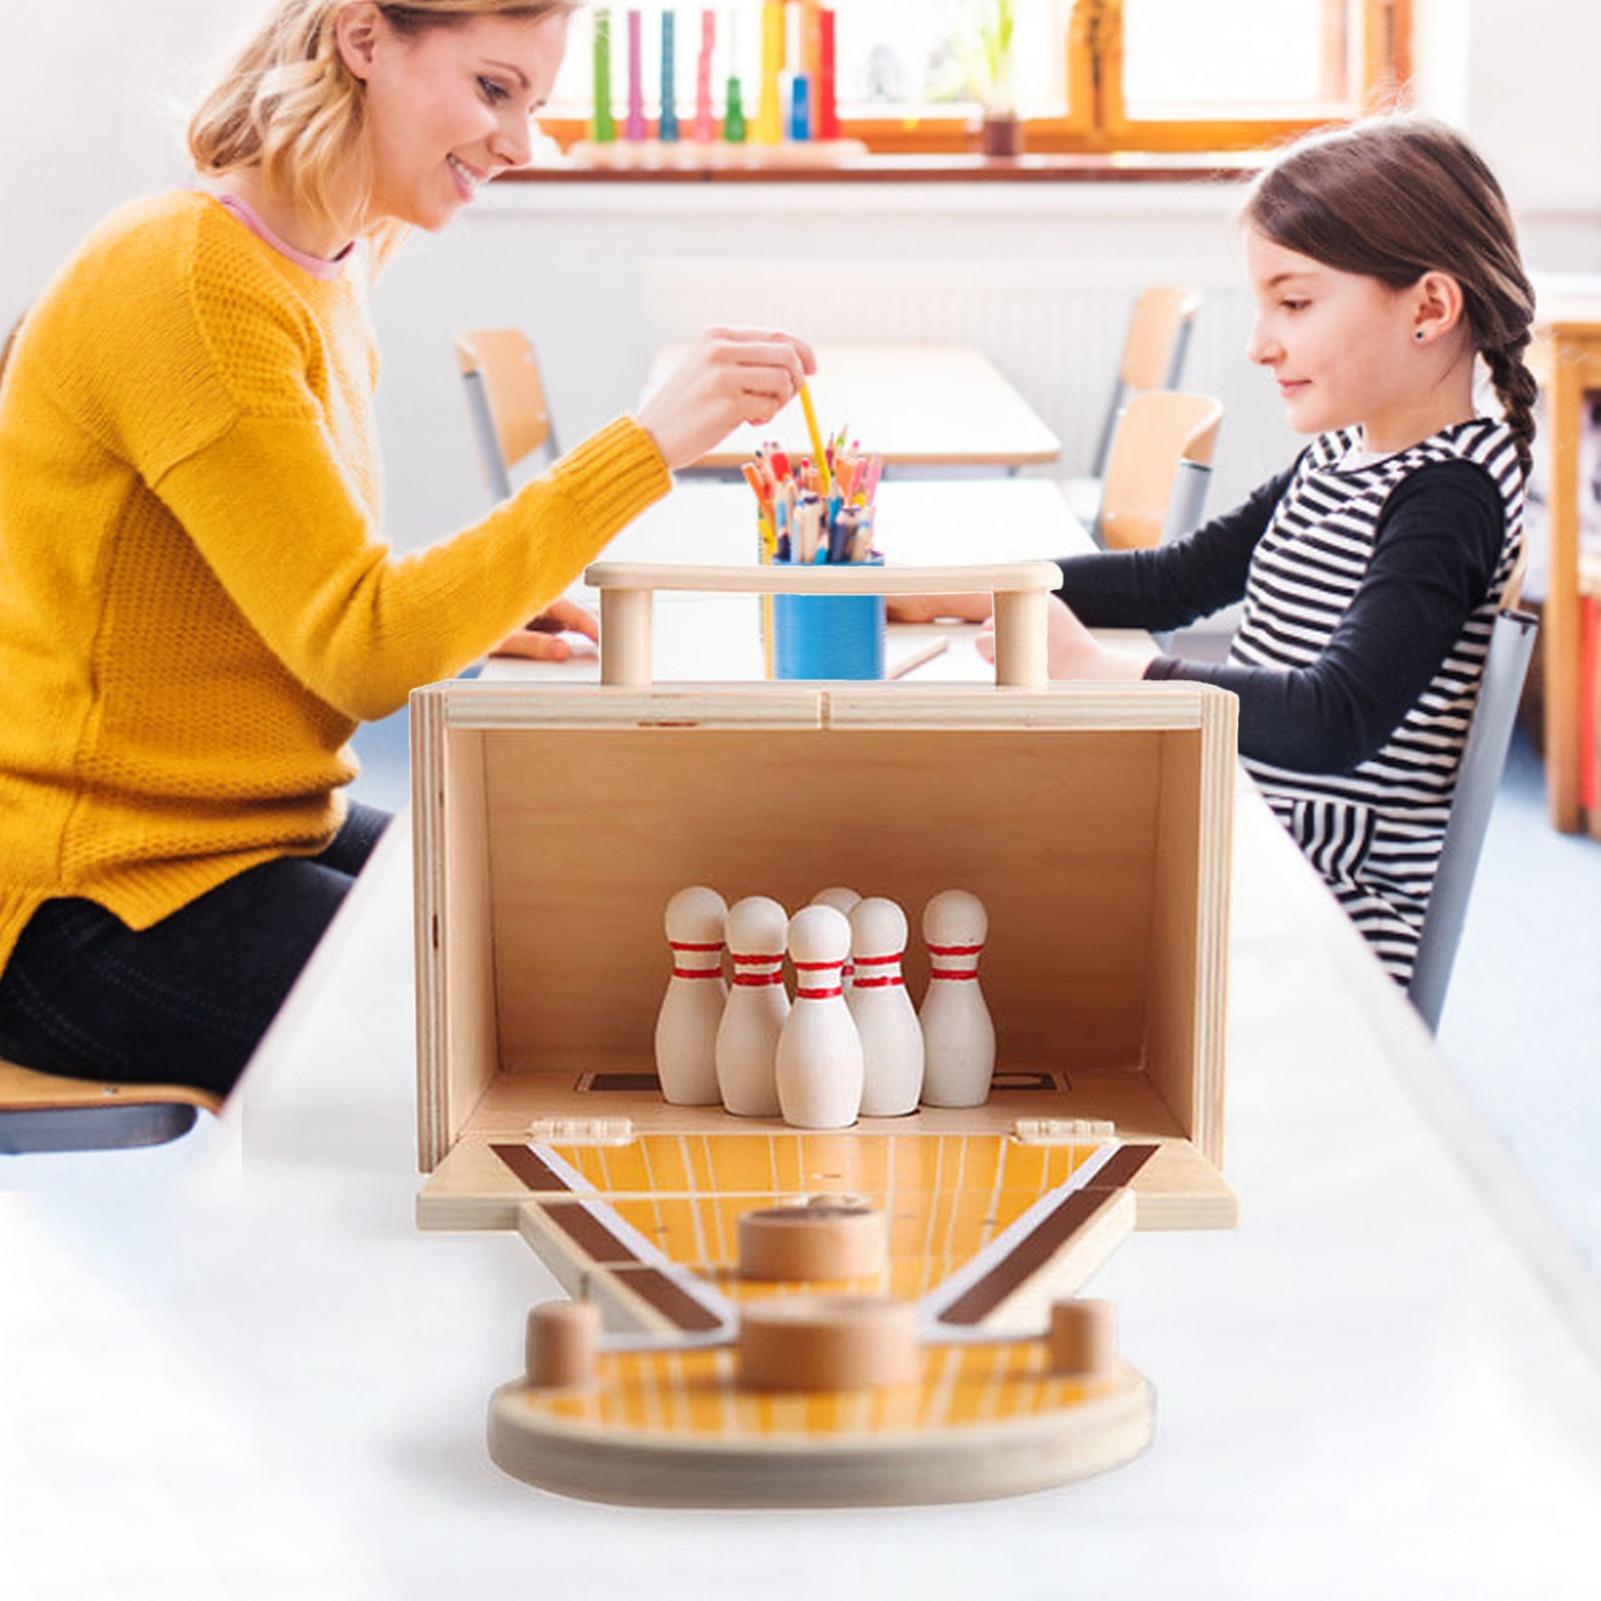 Children's Foldable Desktop Mini Bowling Set Toy Indoor Portable Wooden Desktop Mini Bowling Game Educational Toy